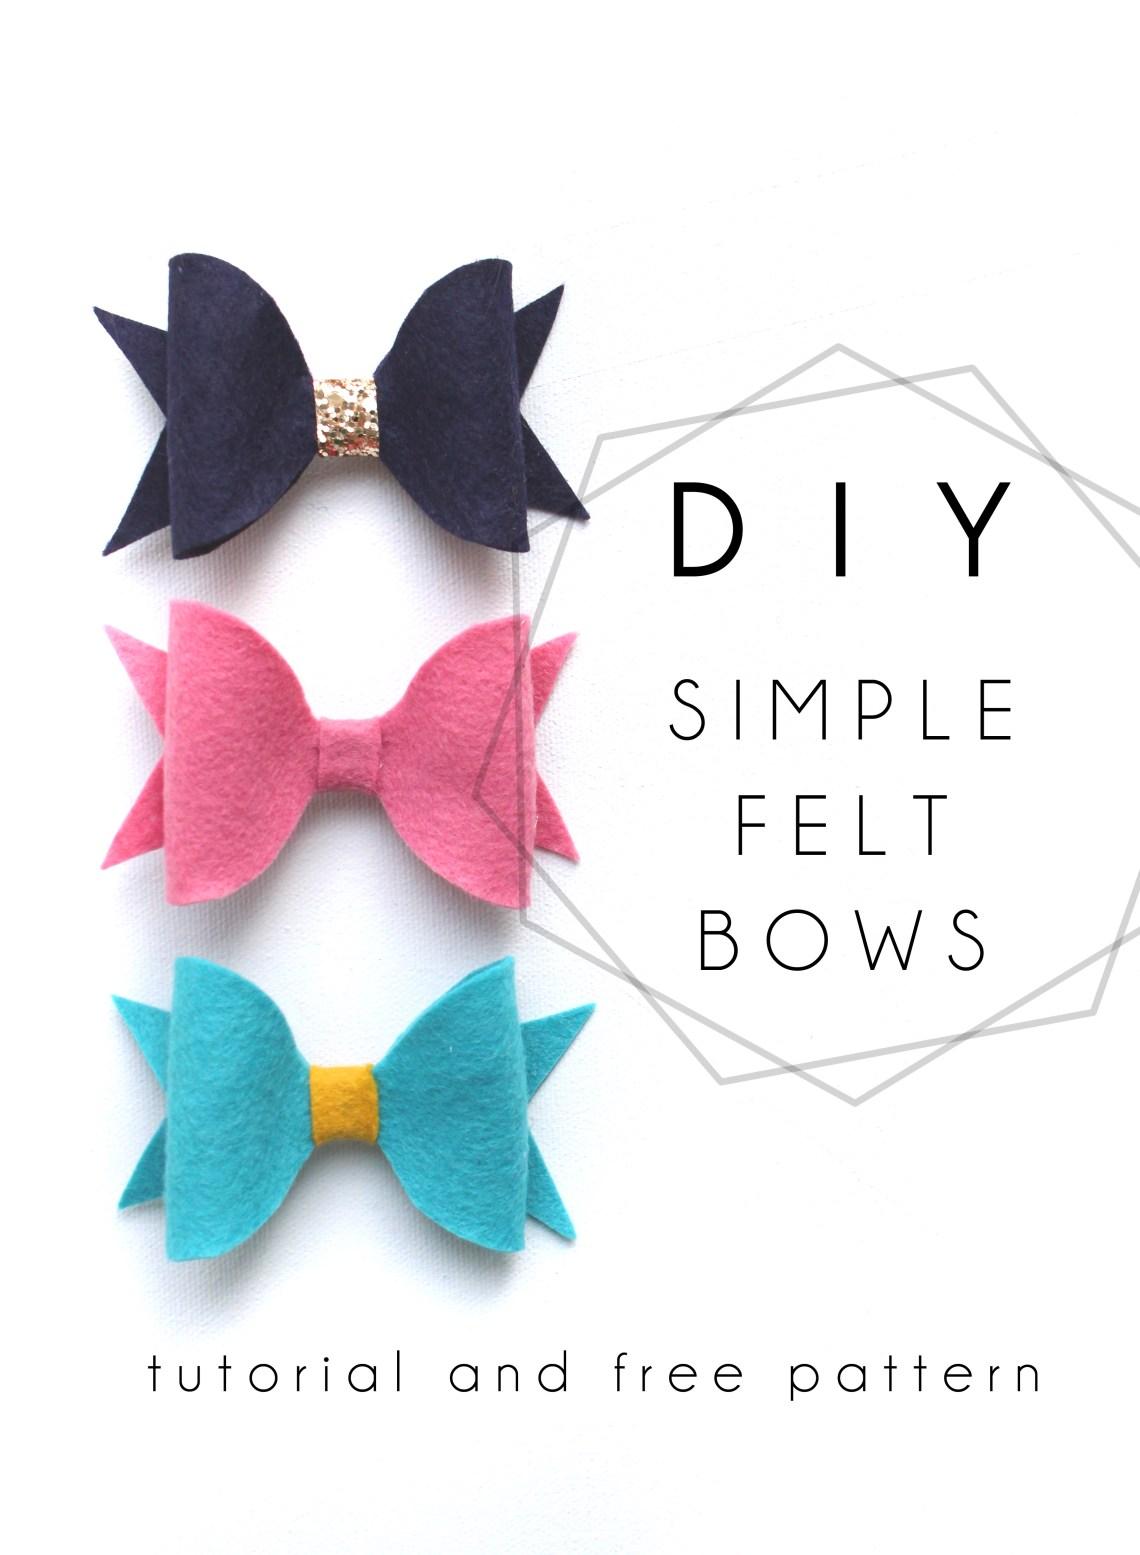 Diy felt bow tutorial with free pdf pattern ashes ivy at home simple diy felt bow tutorial with free printable pdf pattern solutioingenieria Choice Image